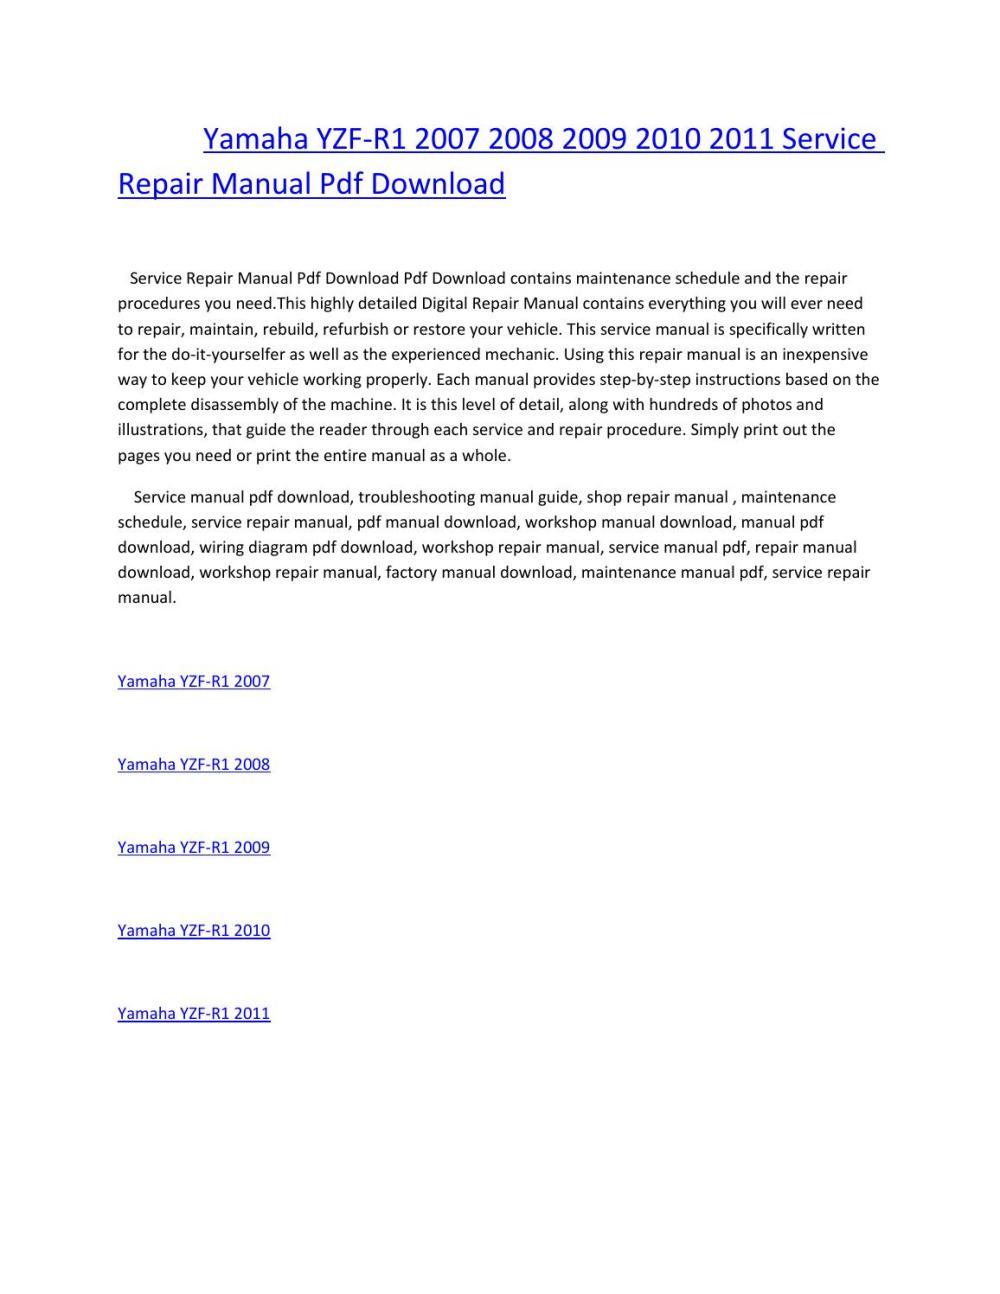 medium resolution of yamaha yzf r1 2007 2008 2009 2010 2011 service repair manual pdf download